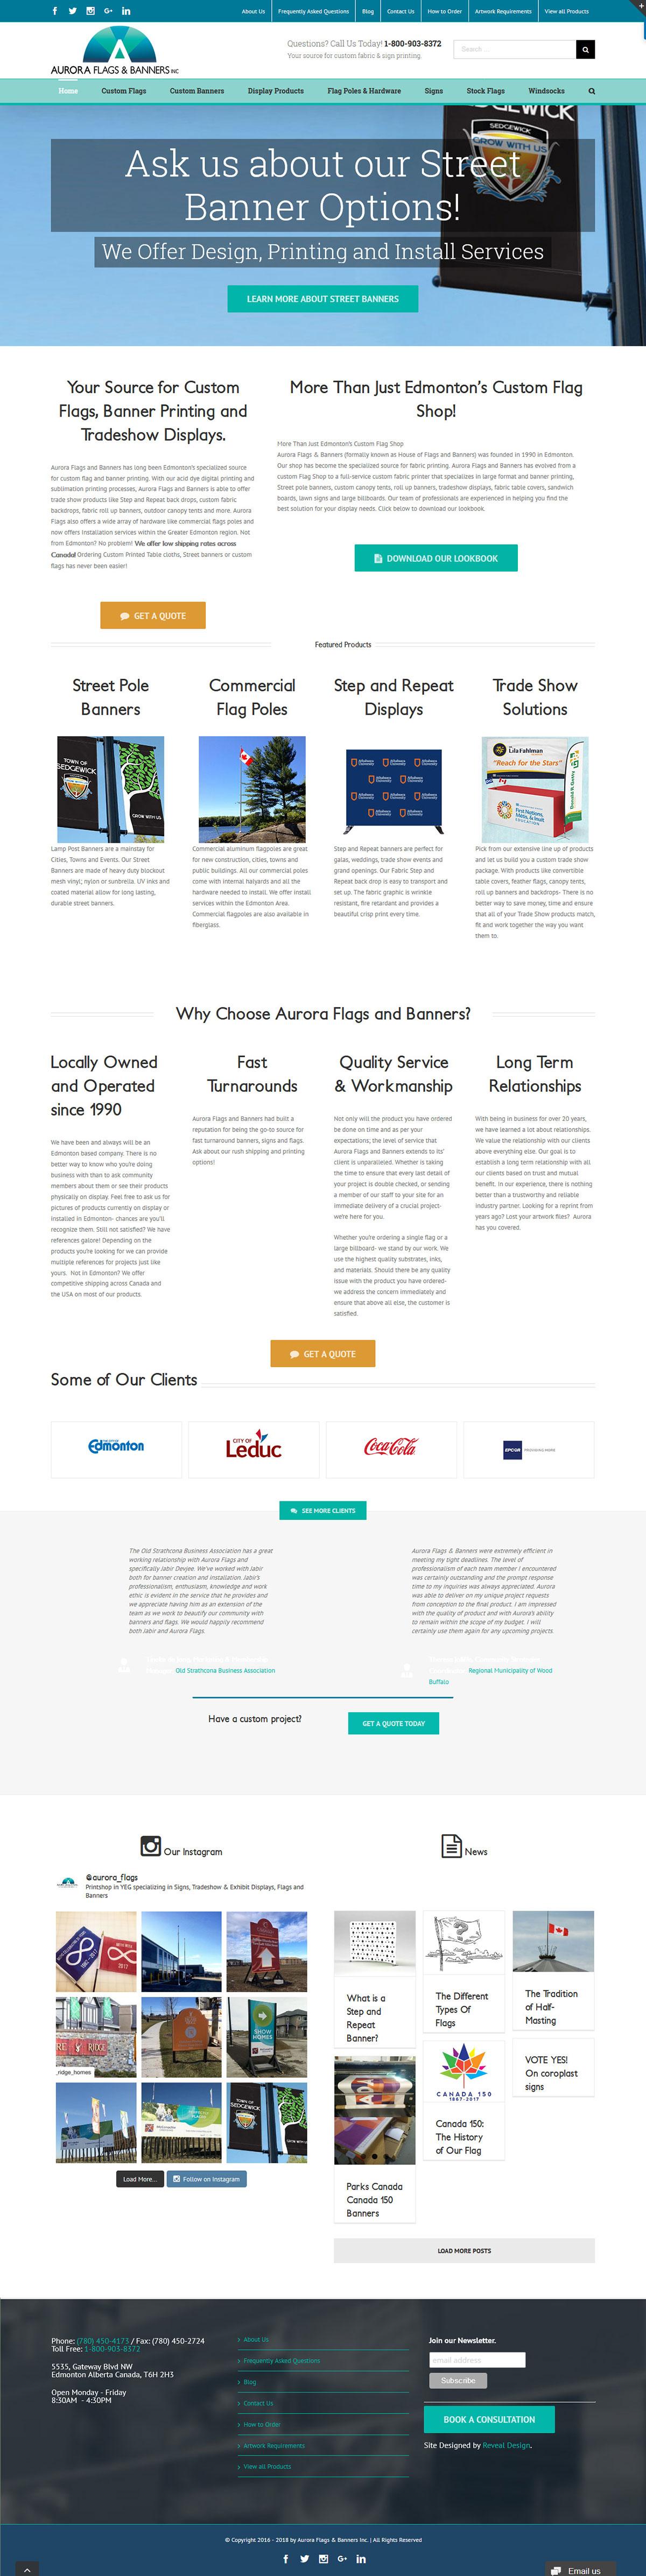 Aurora Flags Printing Website Home